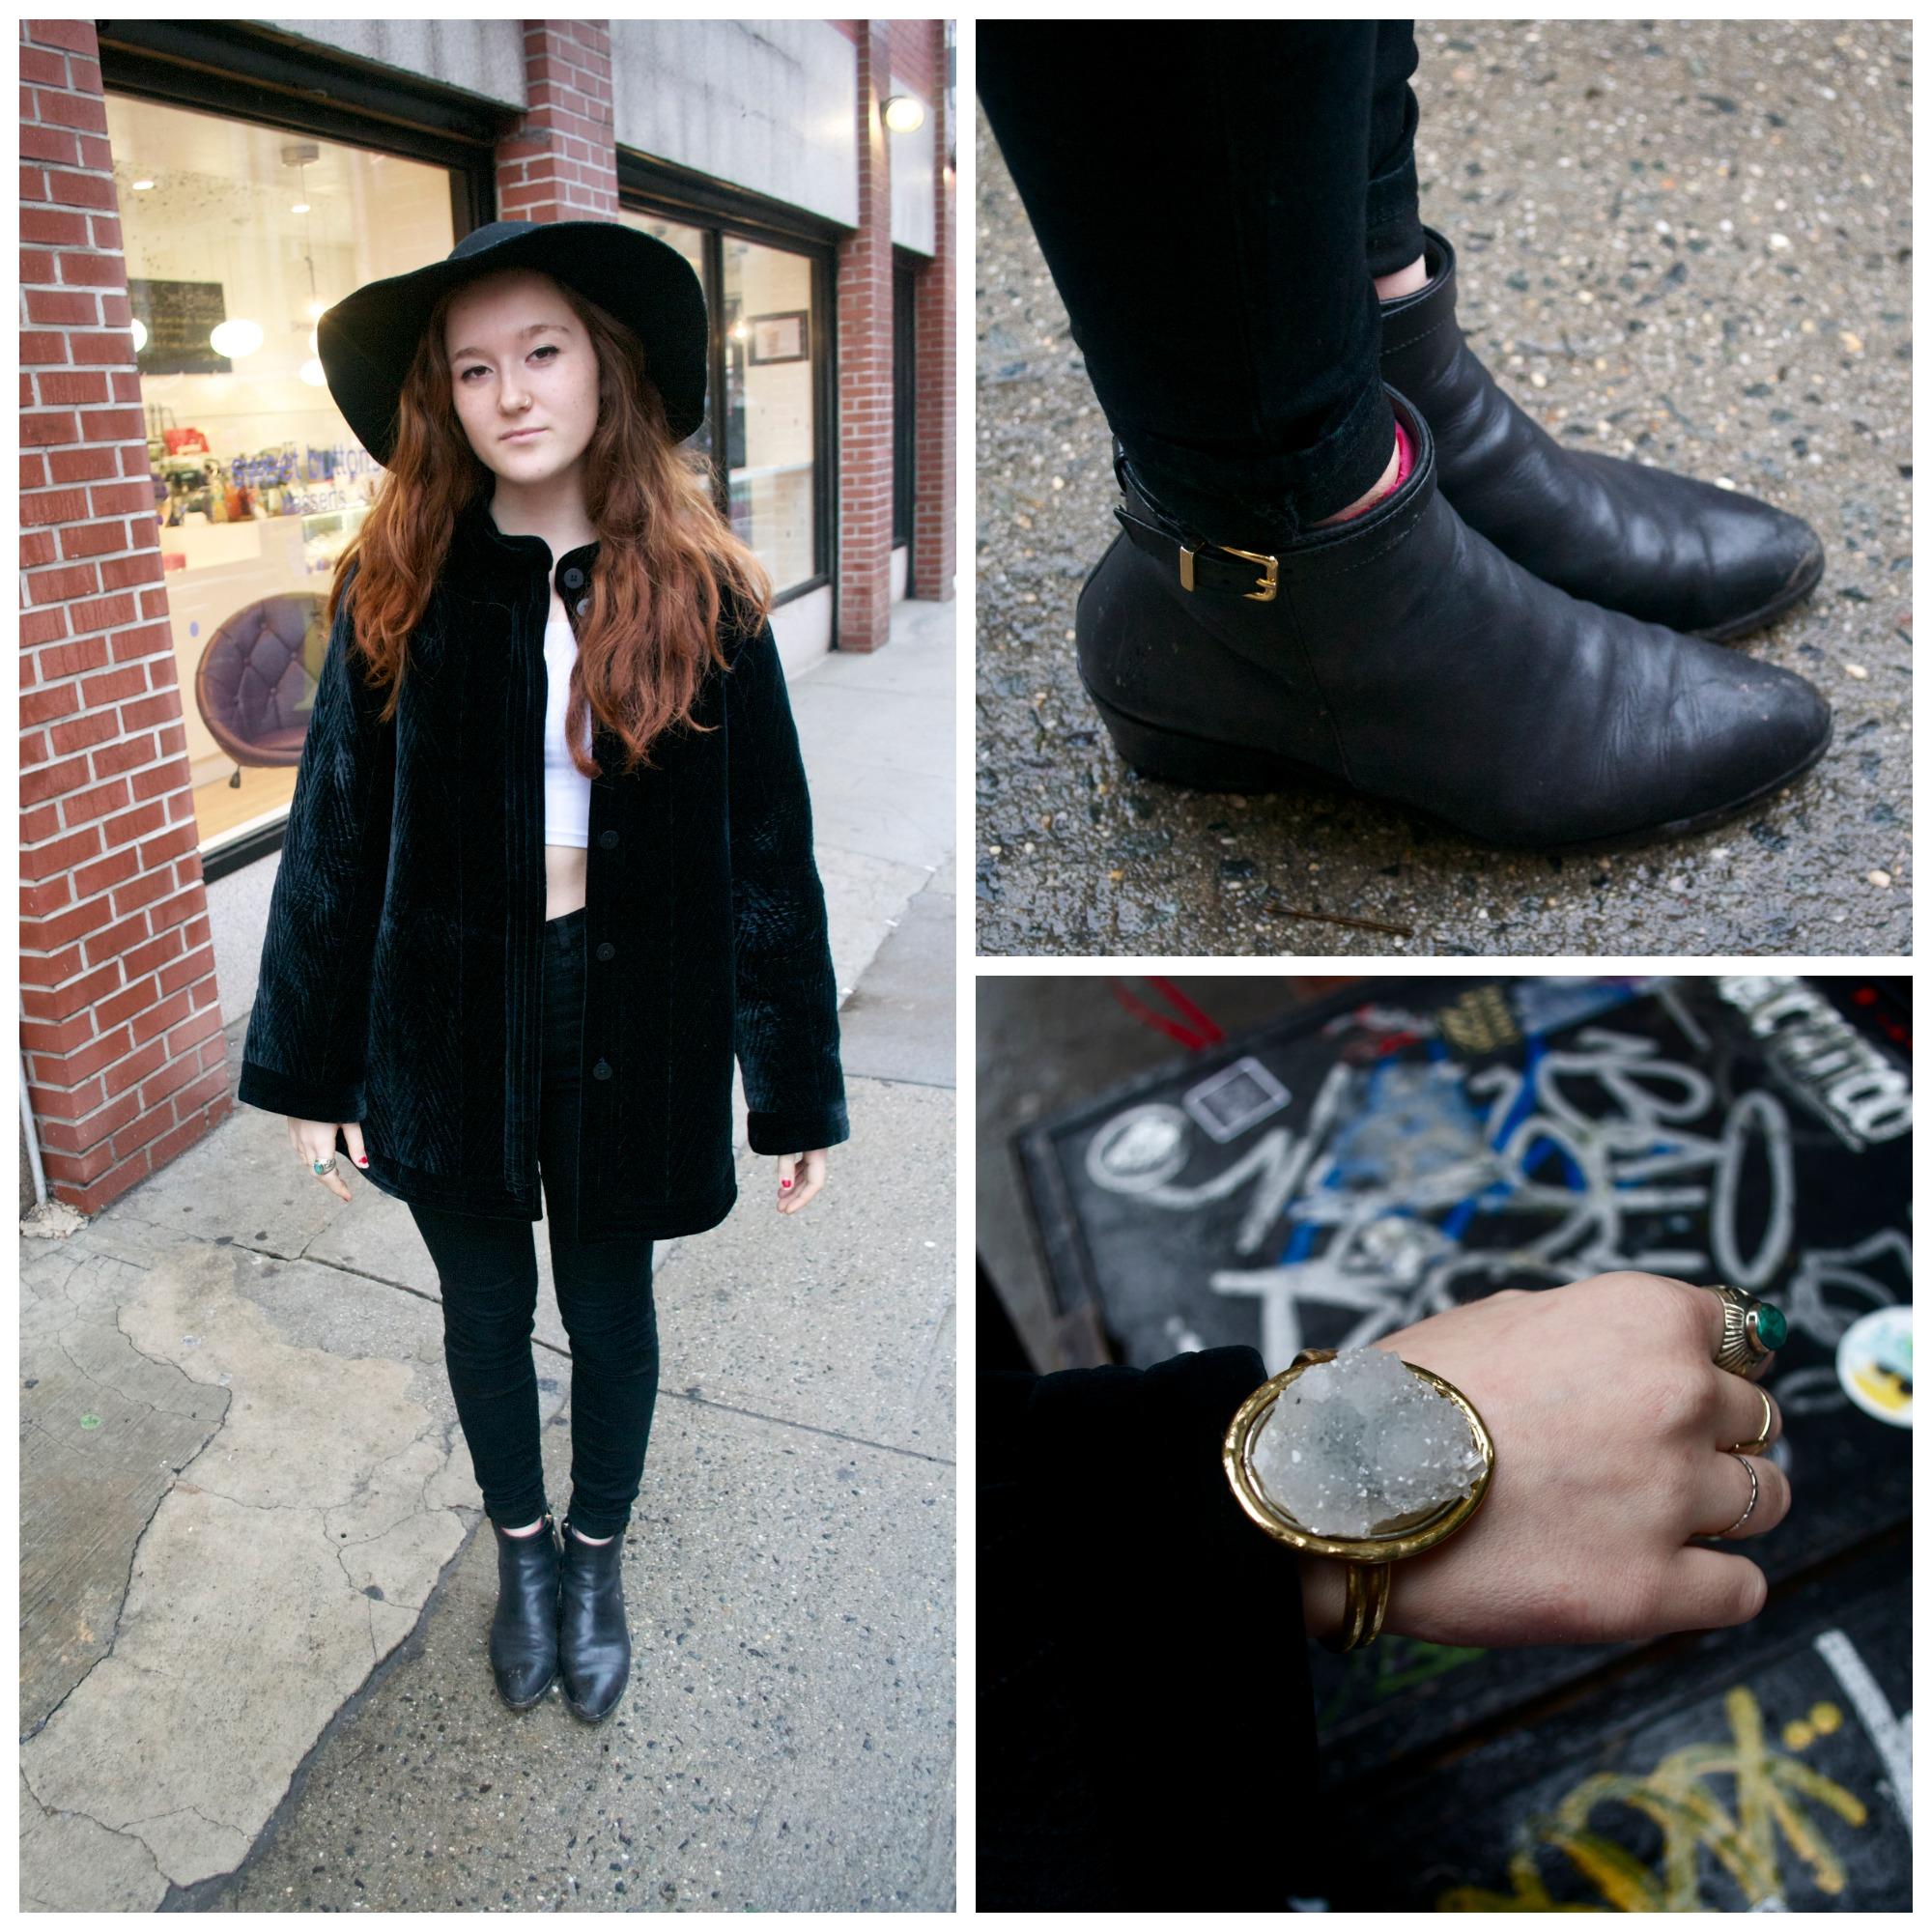 Jacket: Beacons Closet Pants: Urban OUtfiiters Top: American Apparel Boots: J Crew  Hat: American Apparel Bracelet: Yumi Kim